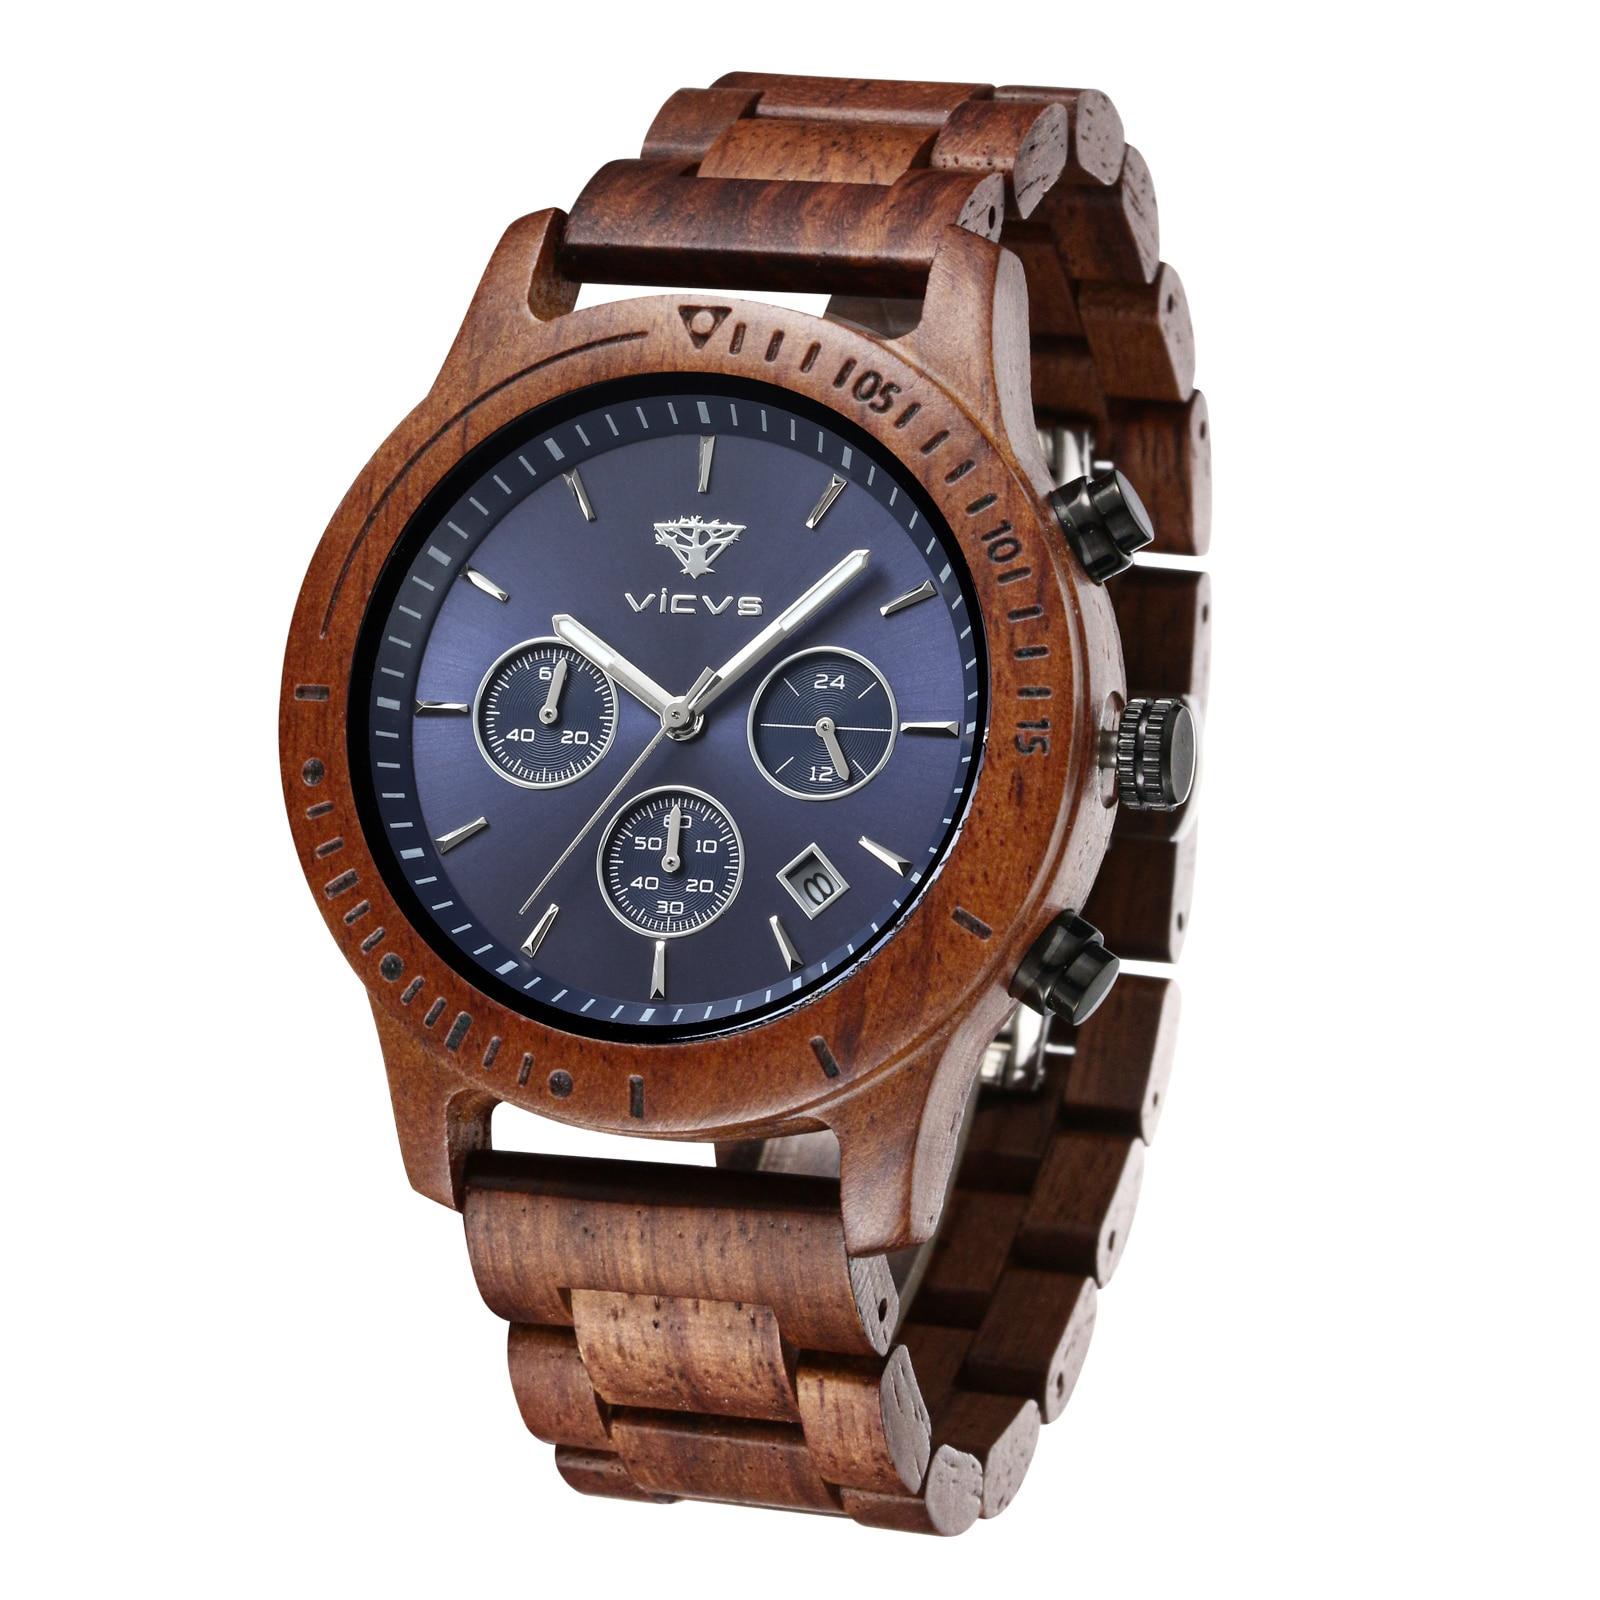 Men's Watch 2021 High-end Fashion Explosive Wood Watch Chronograph Calendar Watch Rosewood Walnut Qu